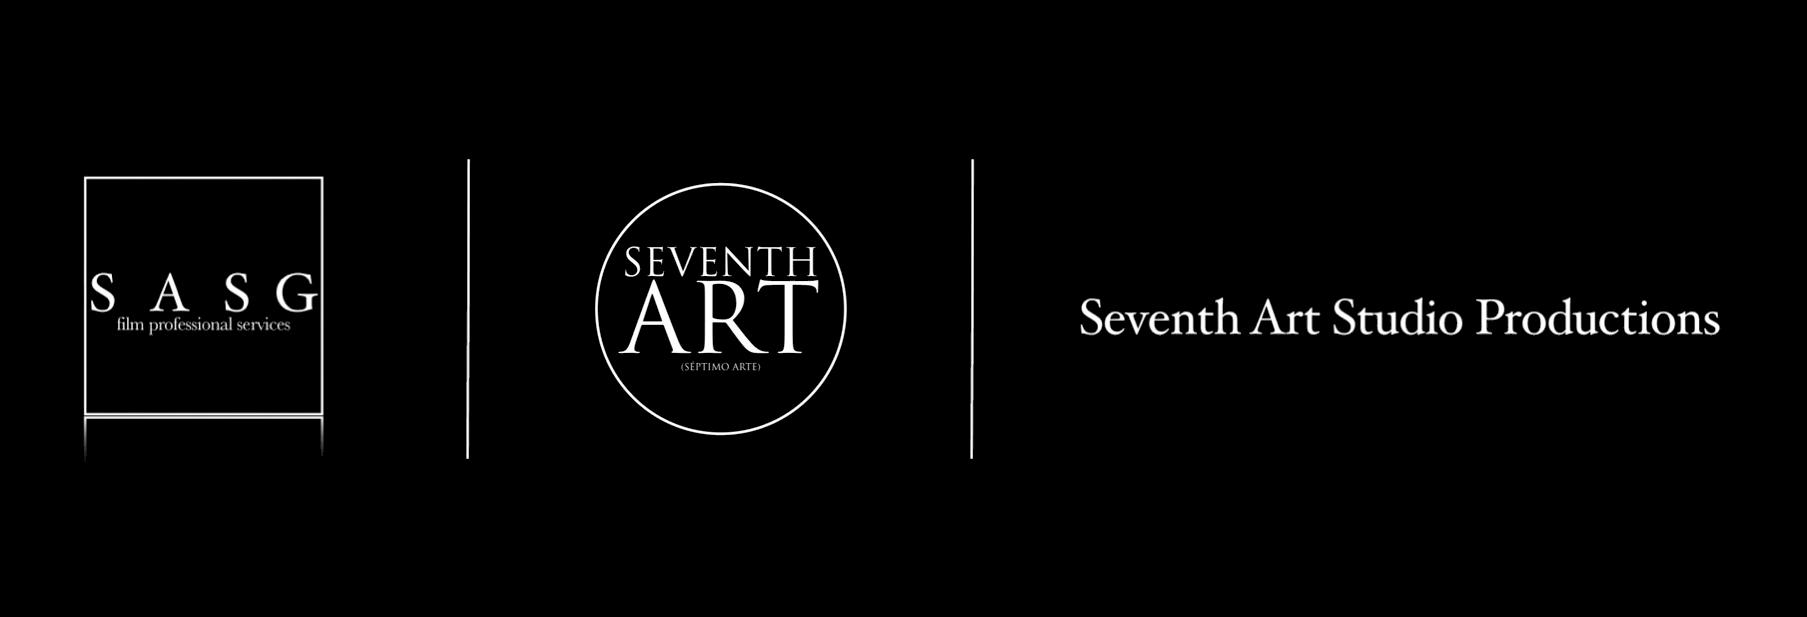 Seventh Art Studio